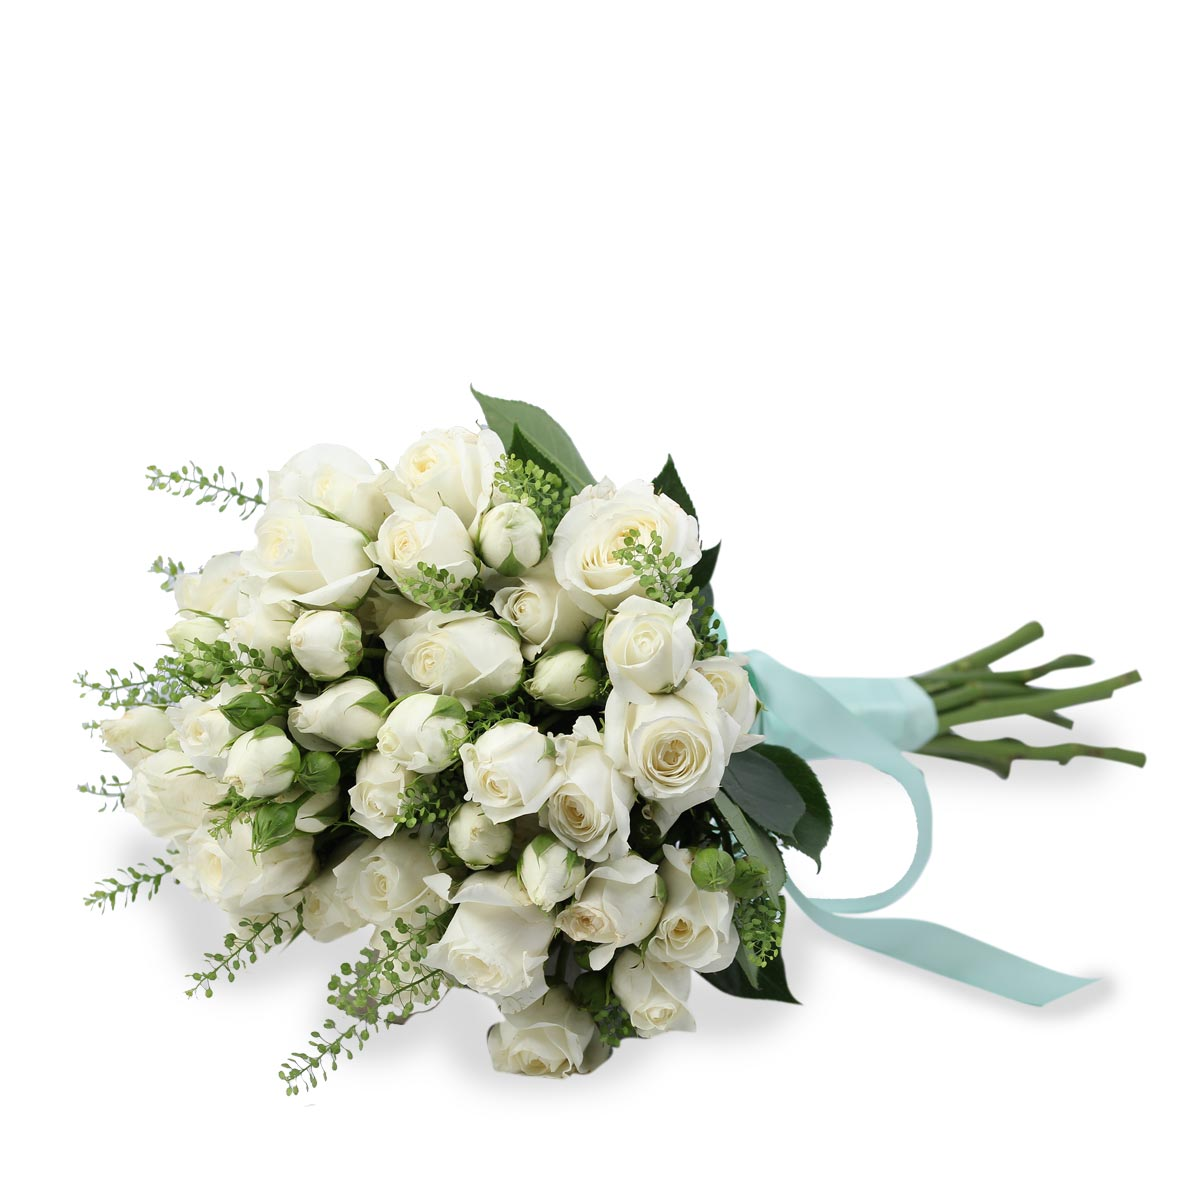 WB1633 ivory cream rose bridal bq